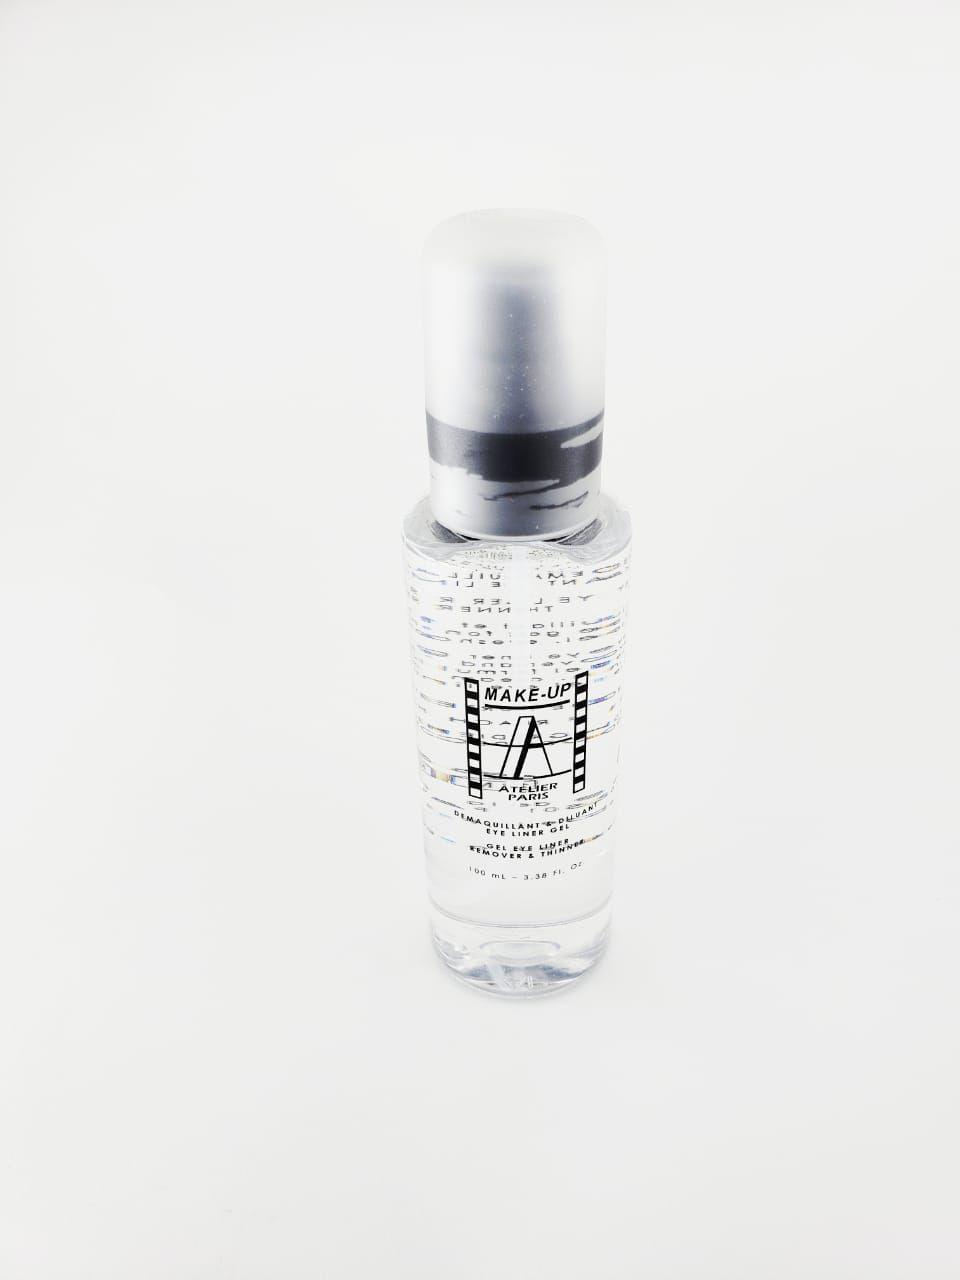 Demaquilante e diluente de delineadores Atelier Paris 100 ml